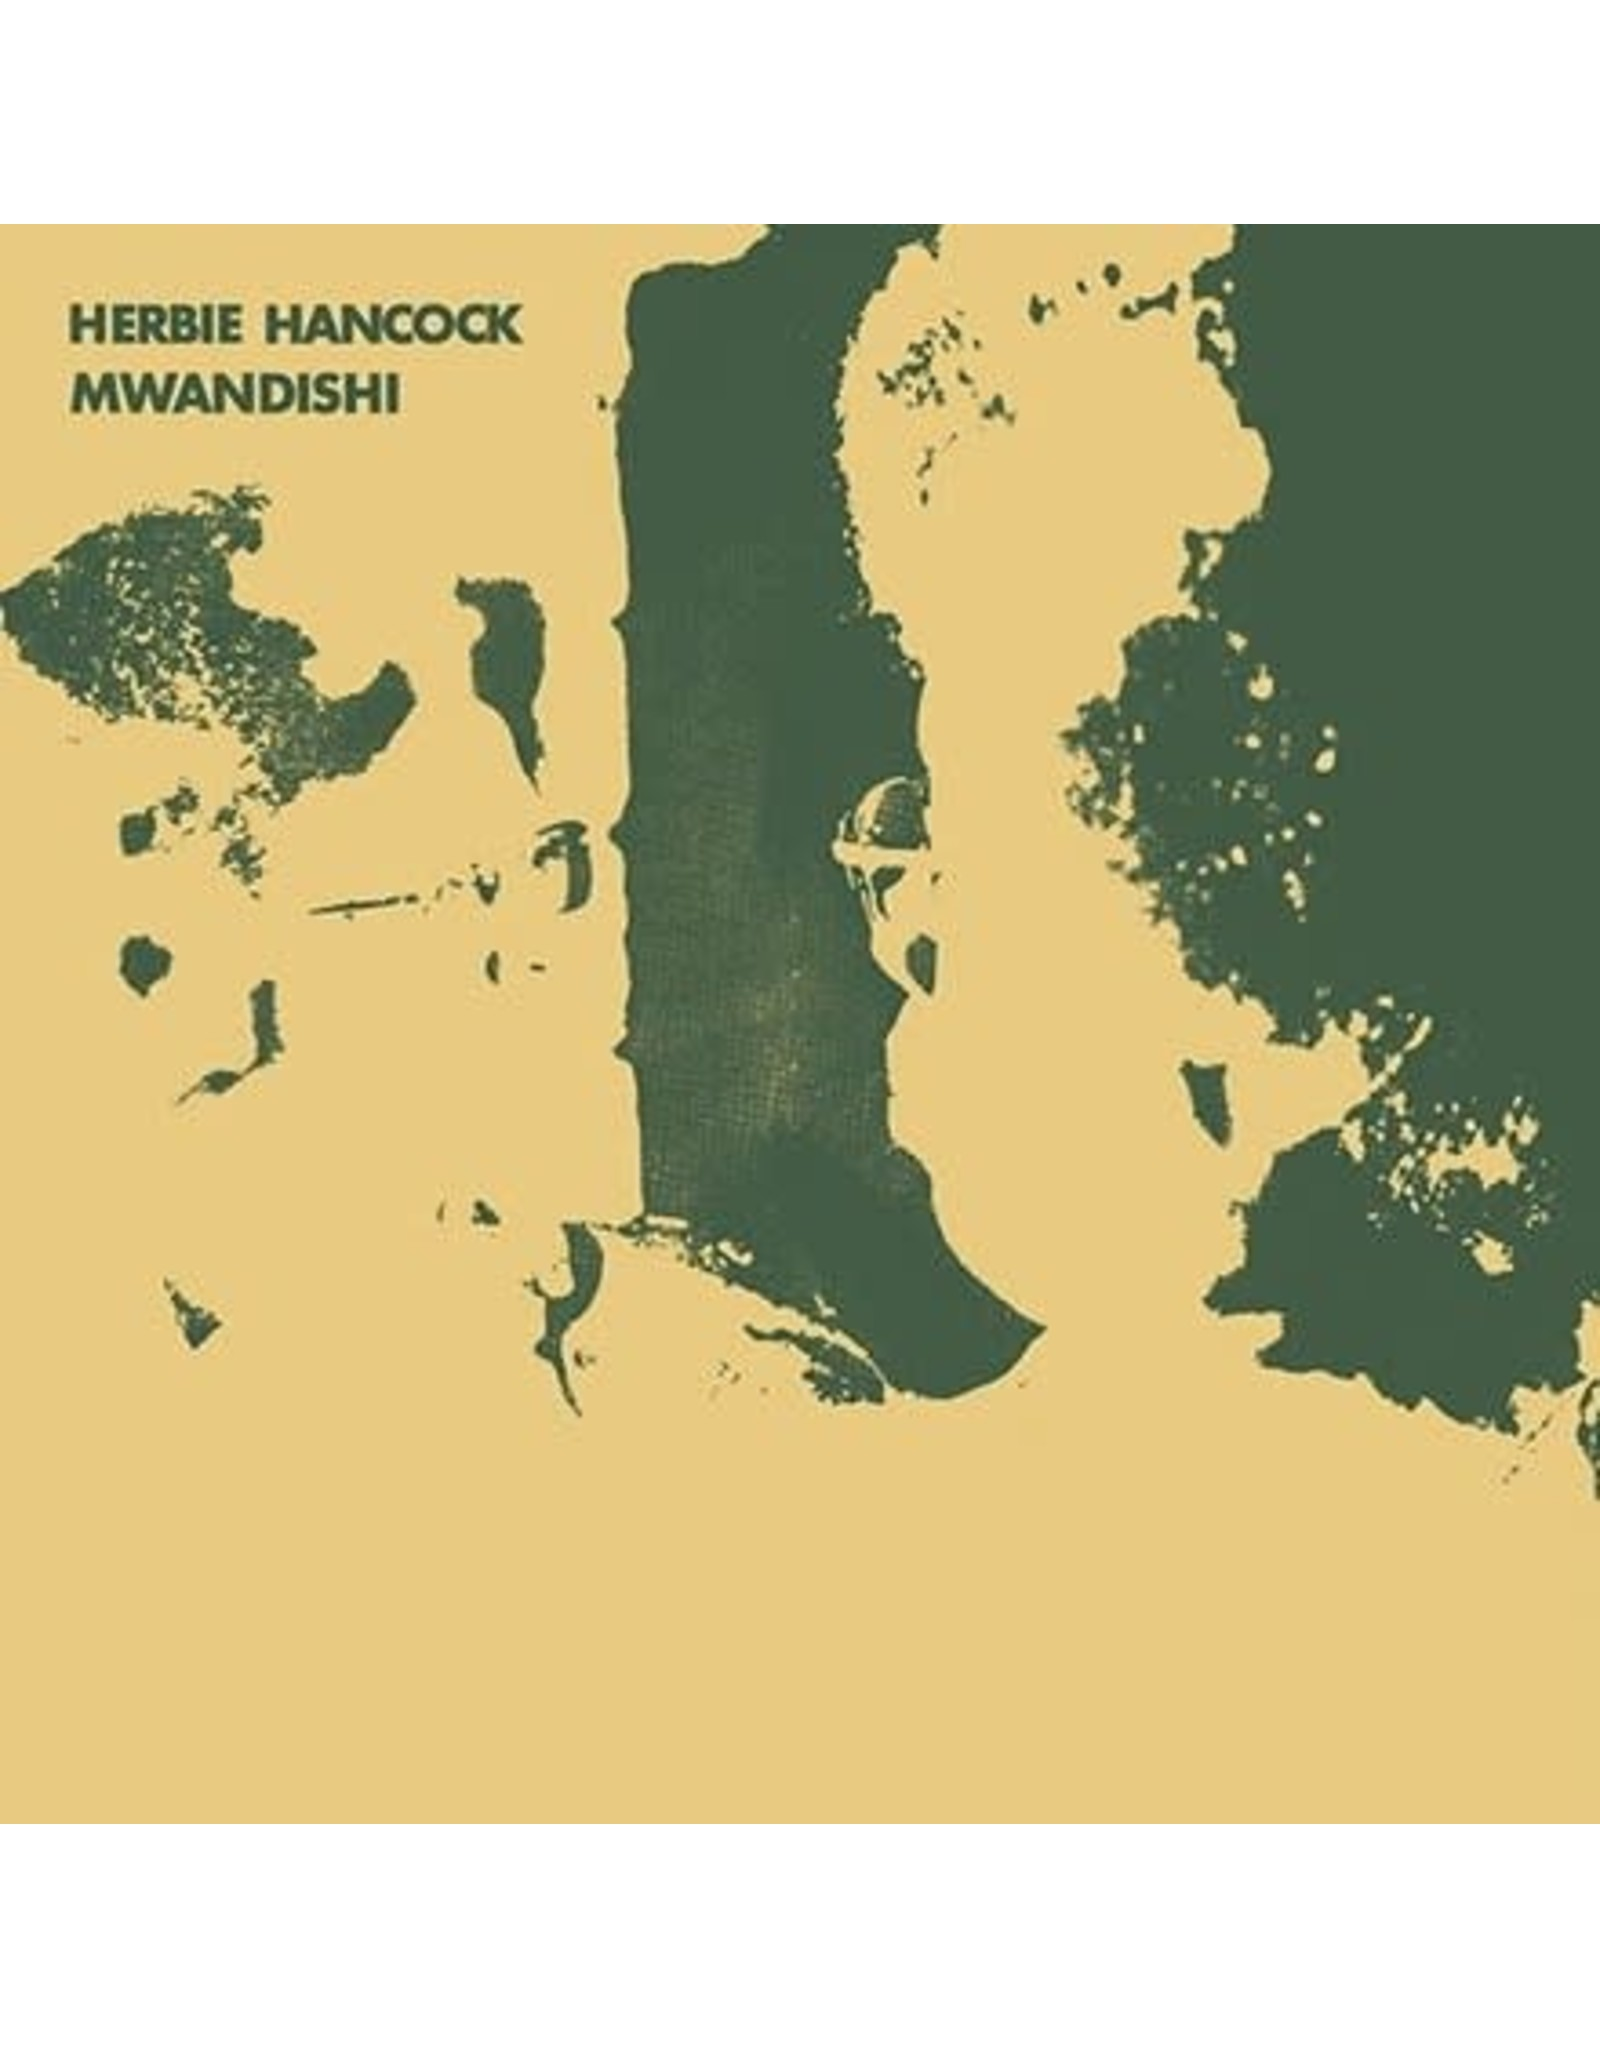 Antarctica Starts Here Hancock, Herbie: Mwandishi LP